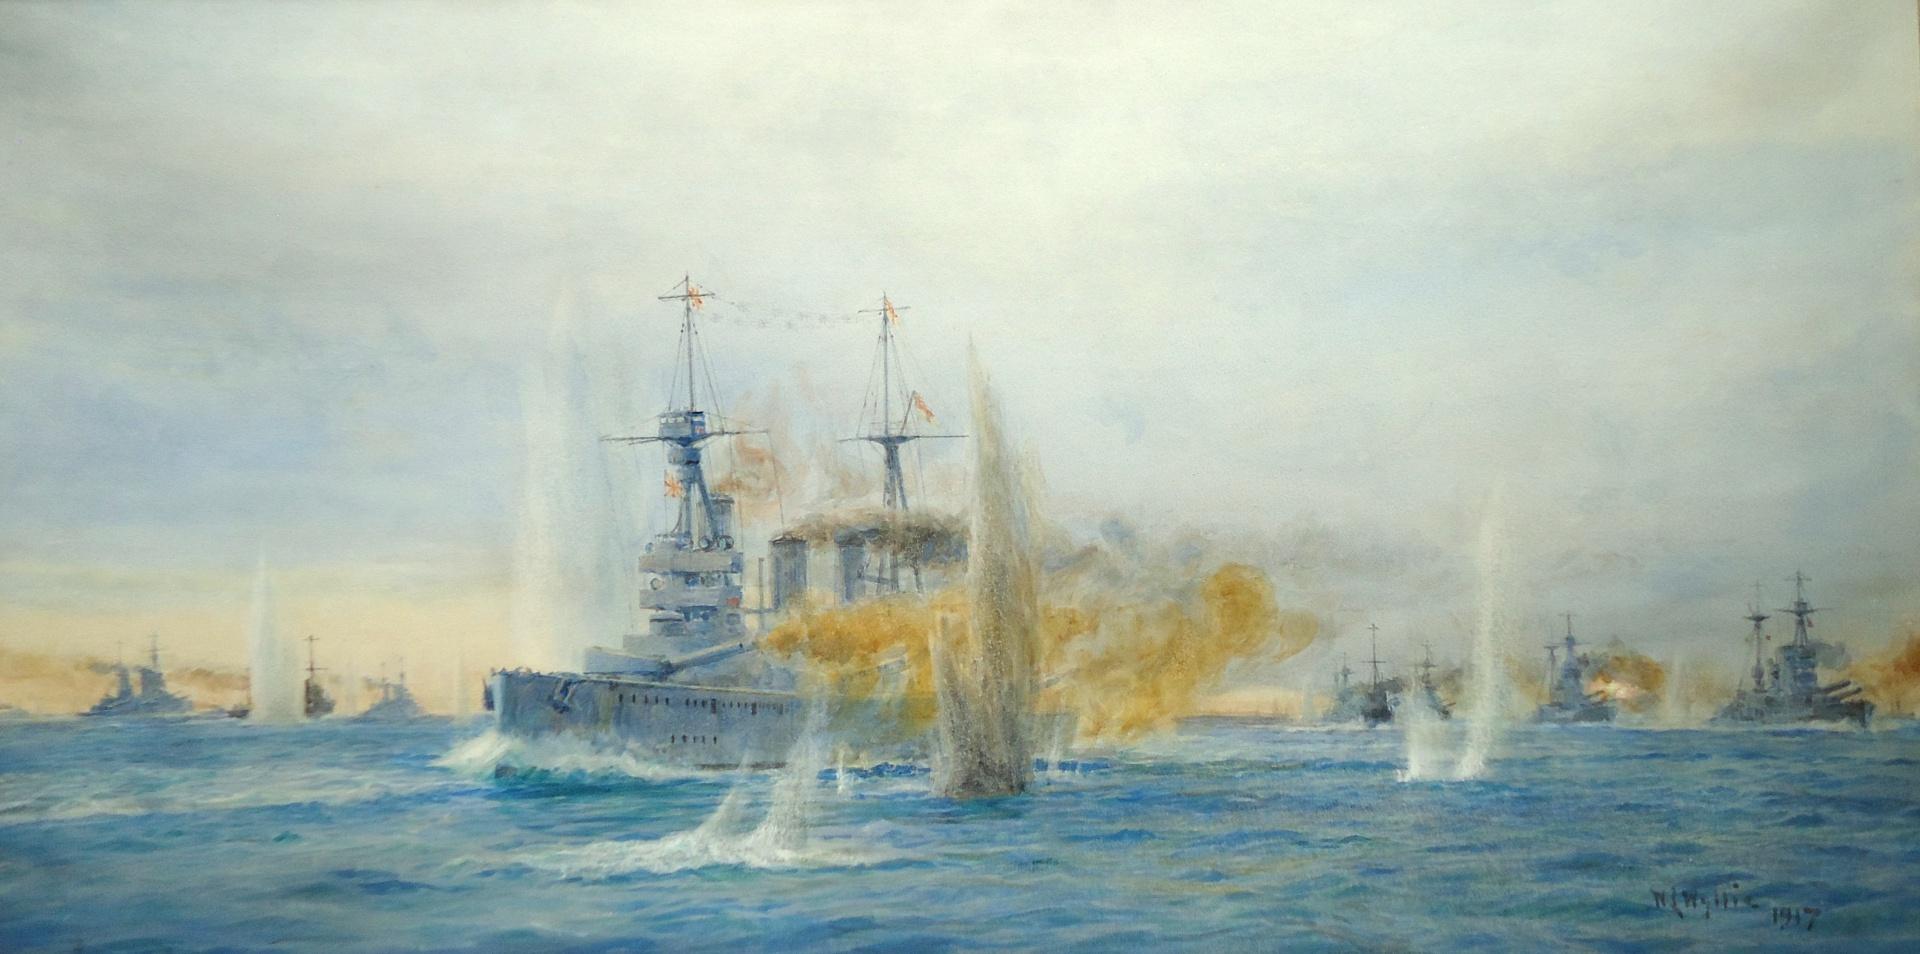 Jutland - HMS NEW ZEALAND - The Sixteen Point Turn